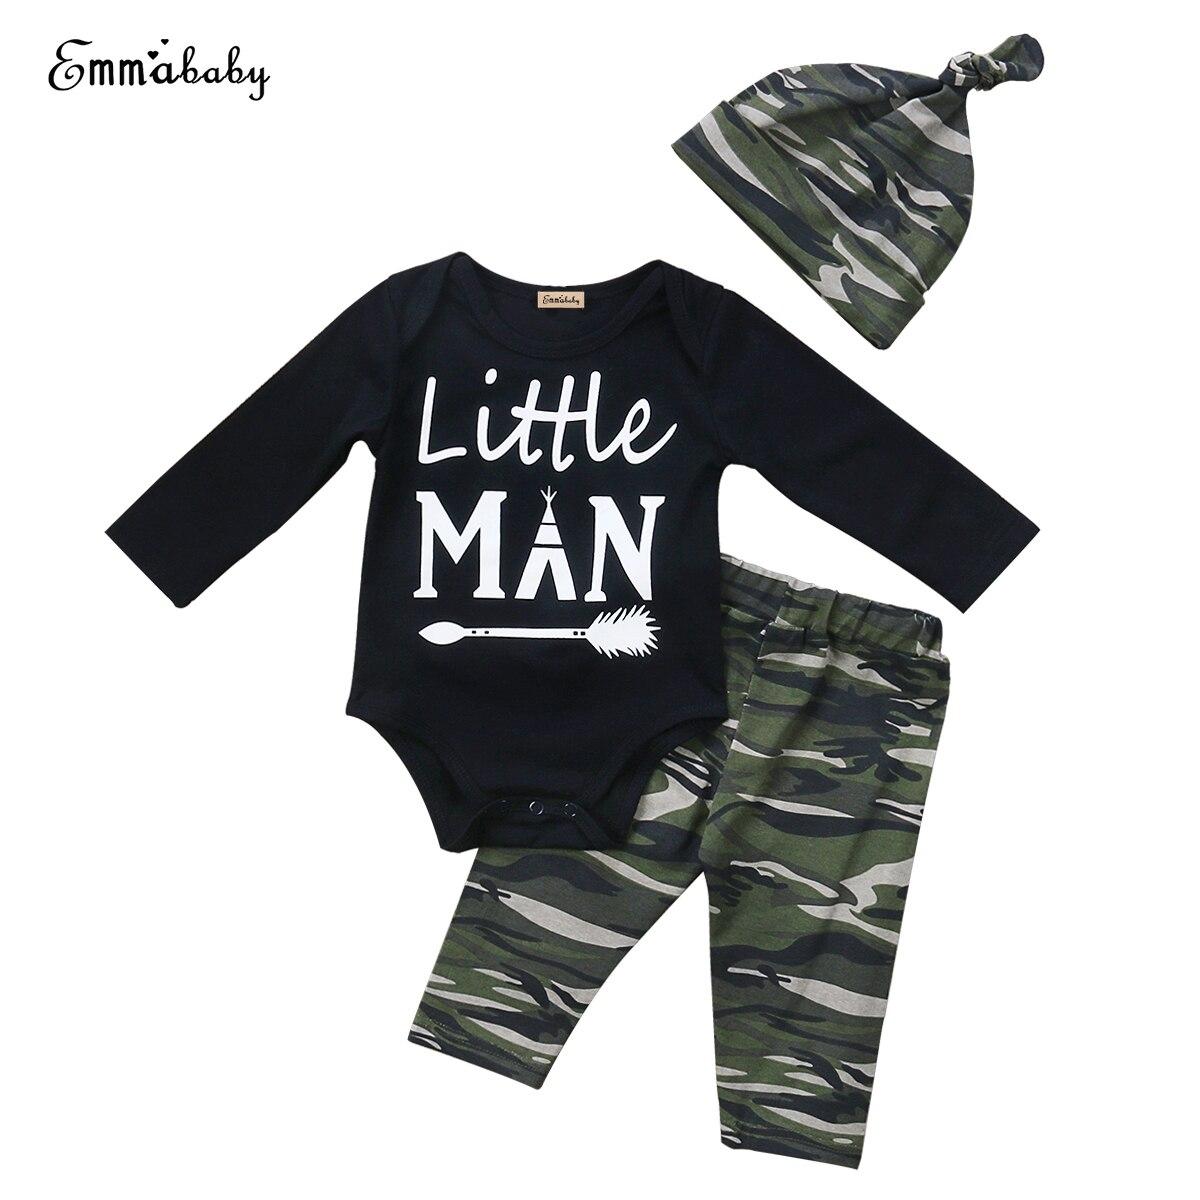 Oto/ño Invierno beb/é ni/ño reci/én Nacido Ropa Camuflaje Camiseta Tops Ropa beb/é pantal/ón Largo Conjunto 0-24 Mes